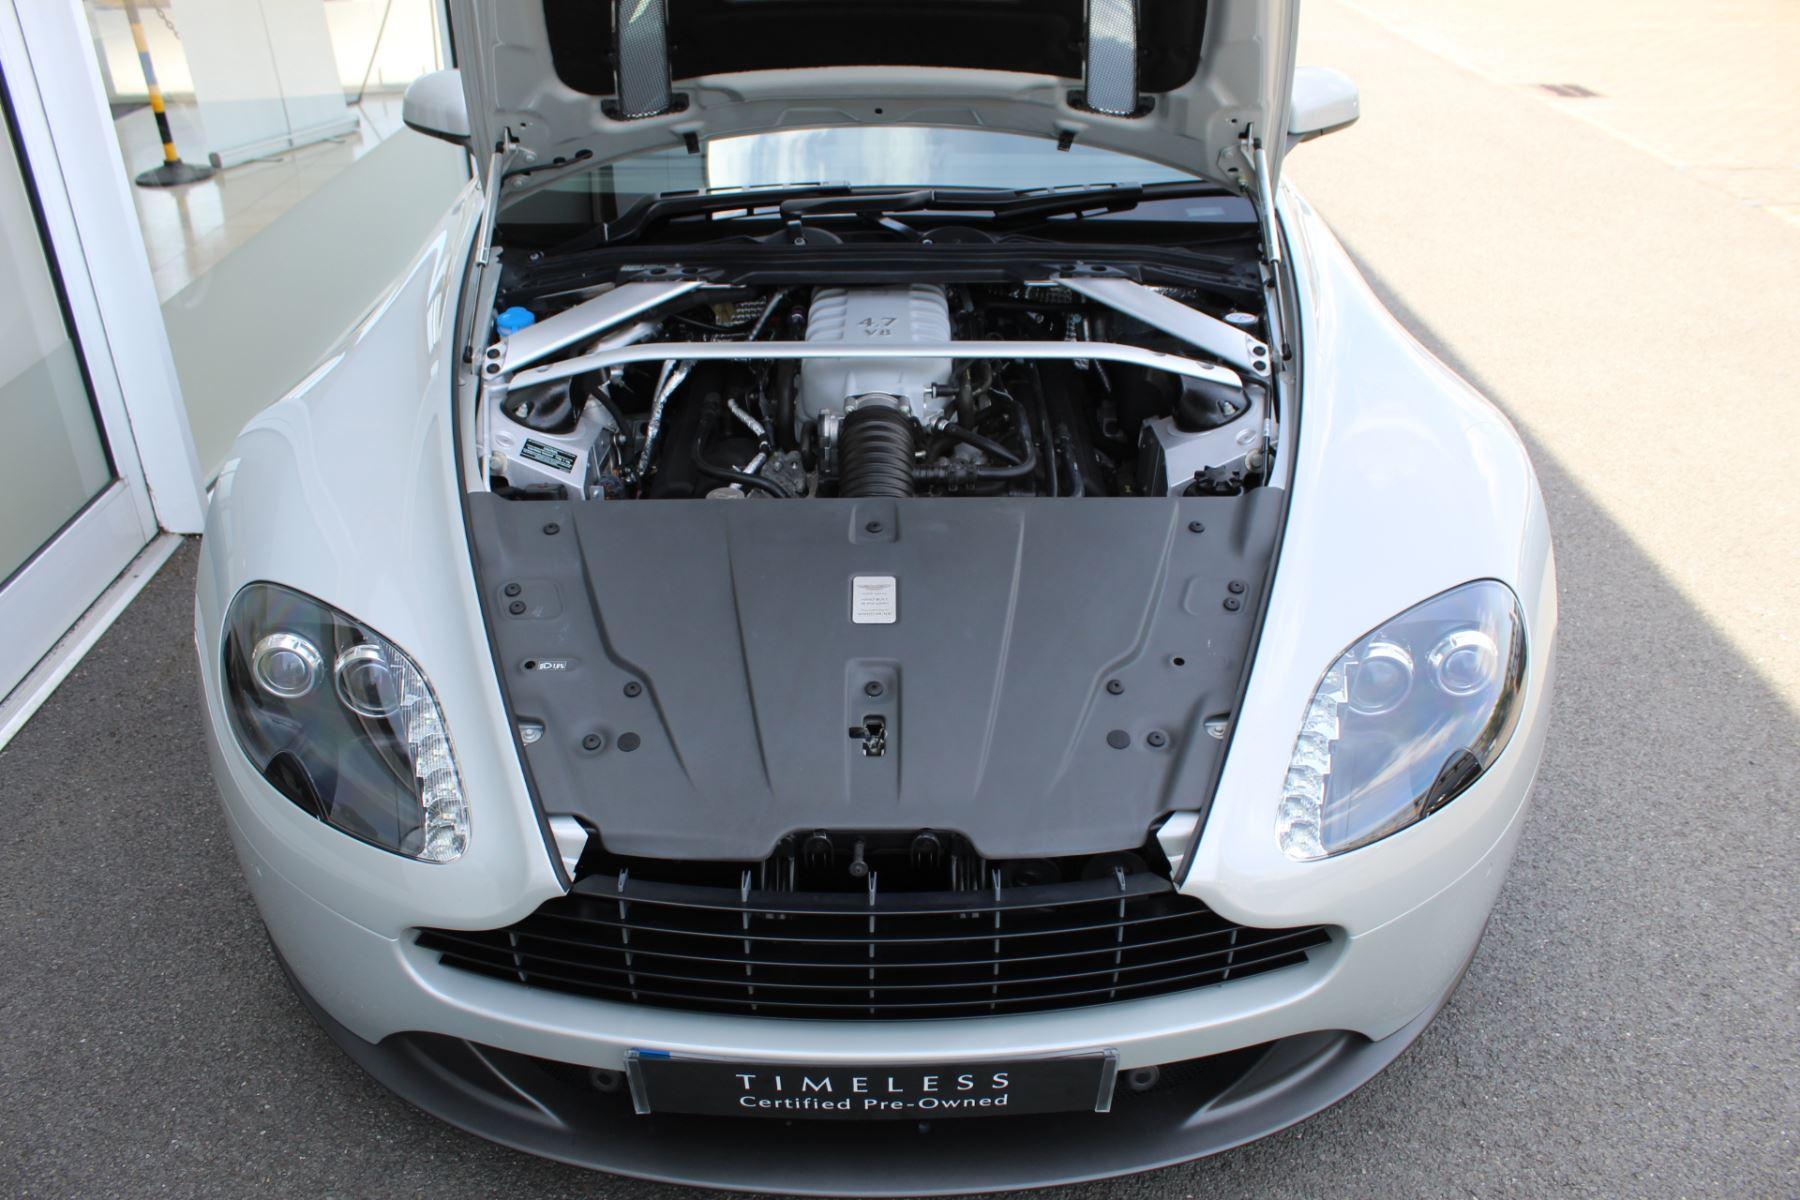 Aston Martin V8 Vantage Coupe 2dr [420] Latest Dash, 420BHP image 16